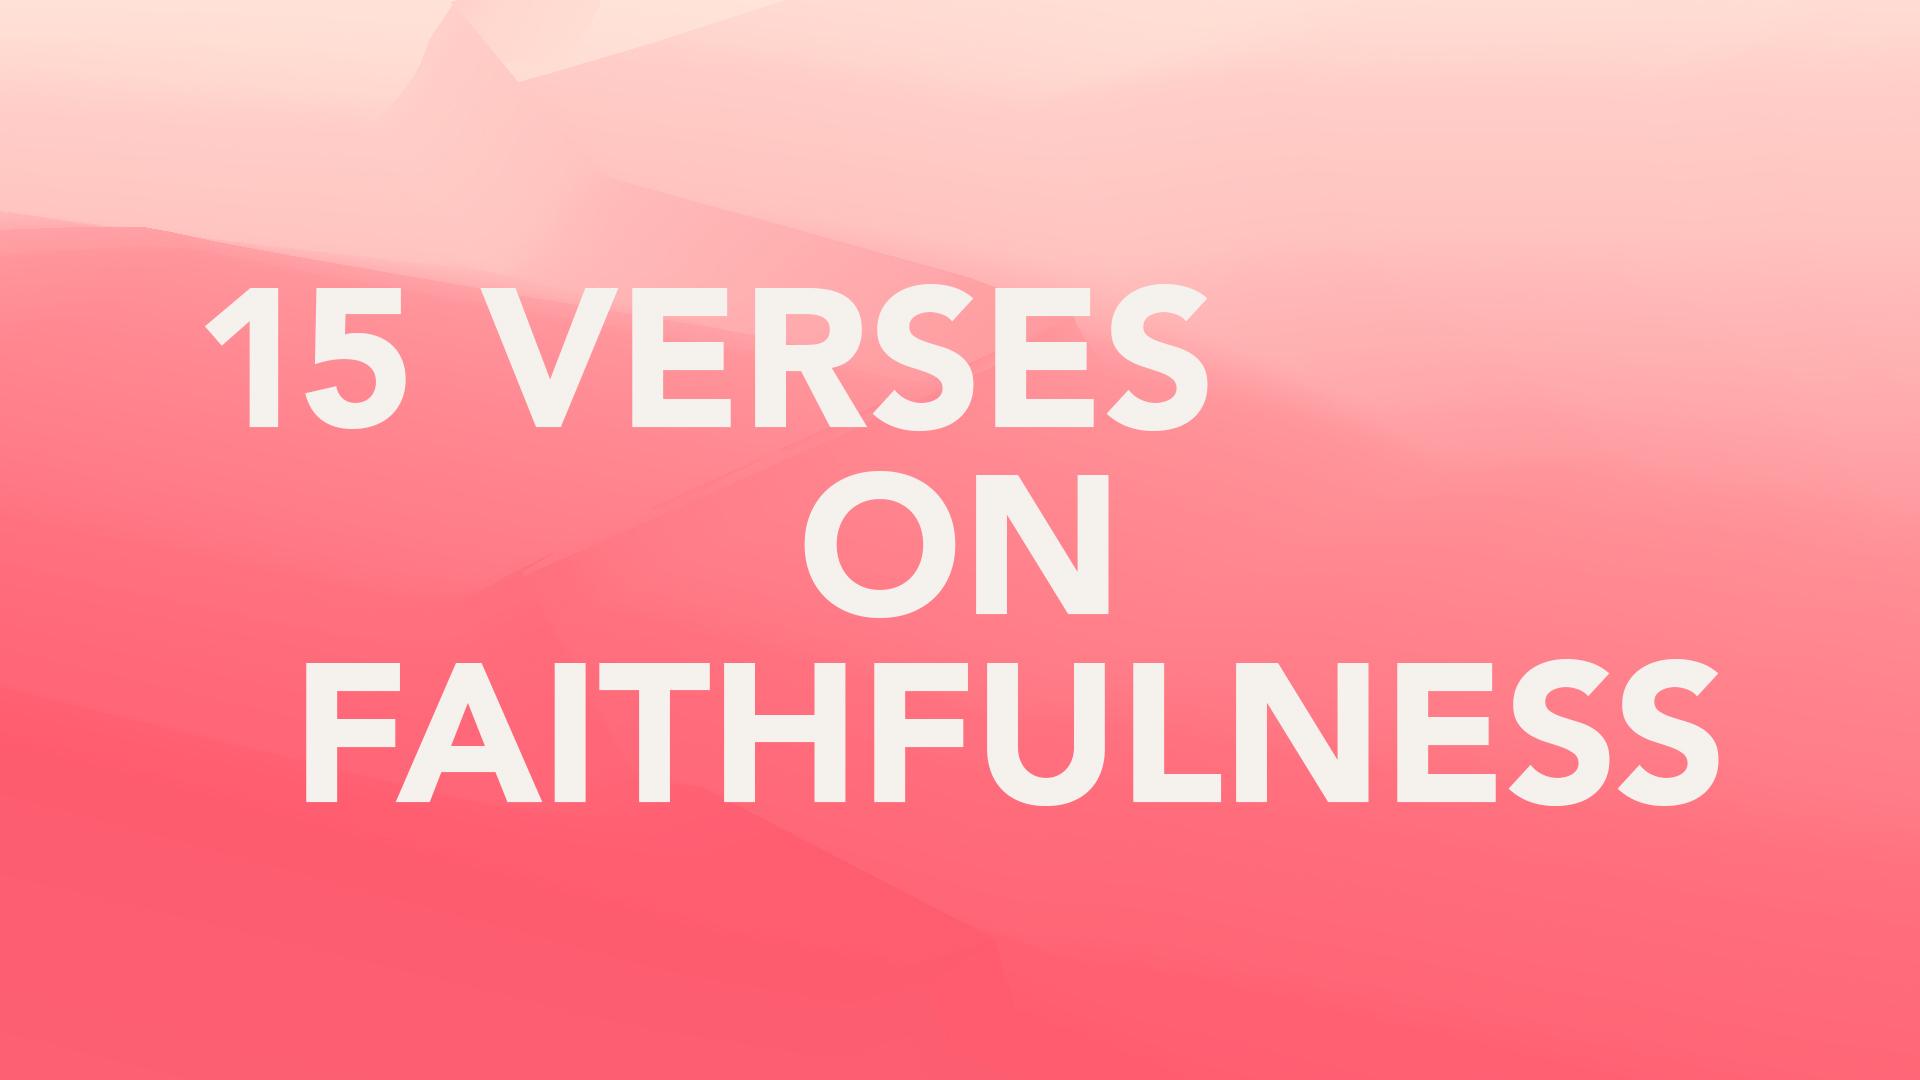 Faithfulness: 15 Verses to Help Hero Image